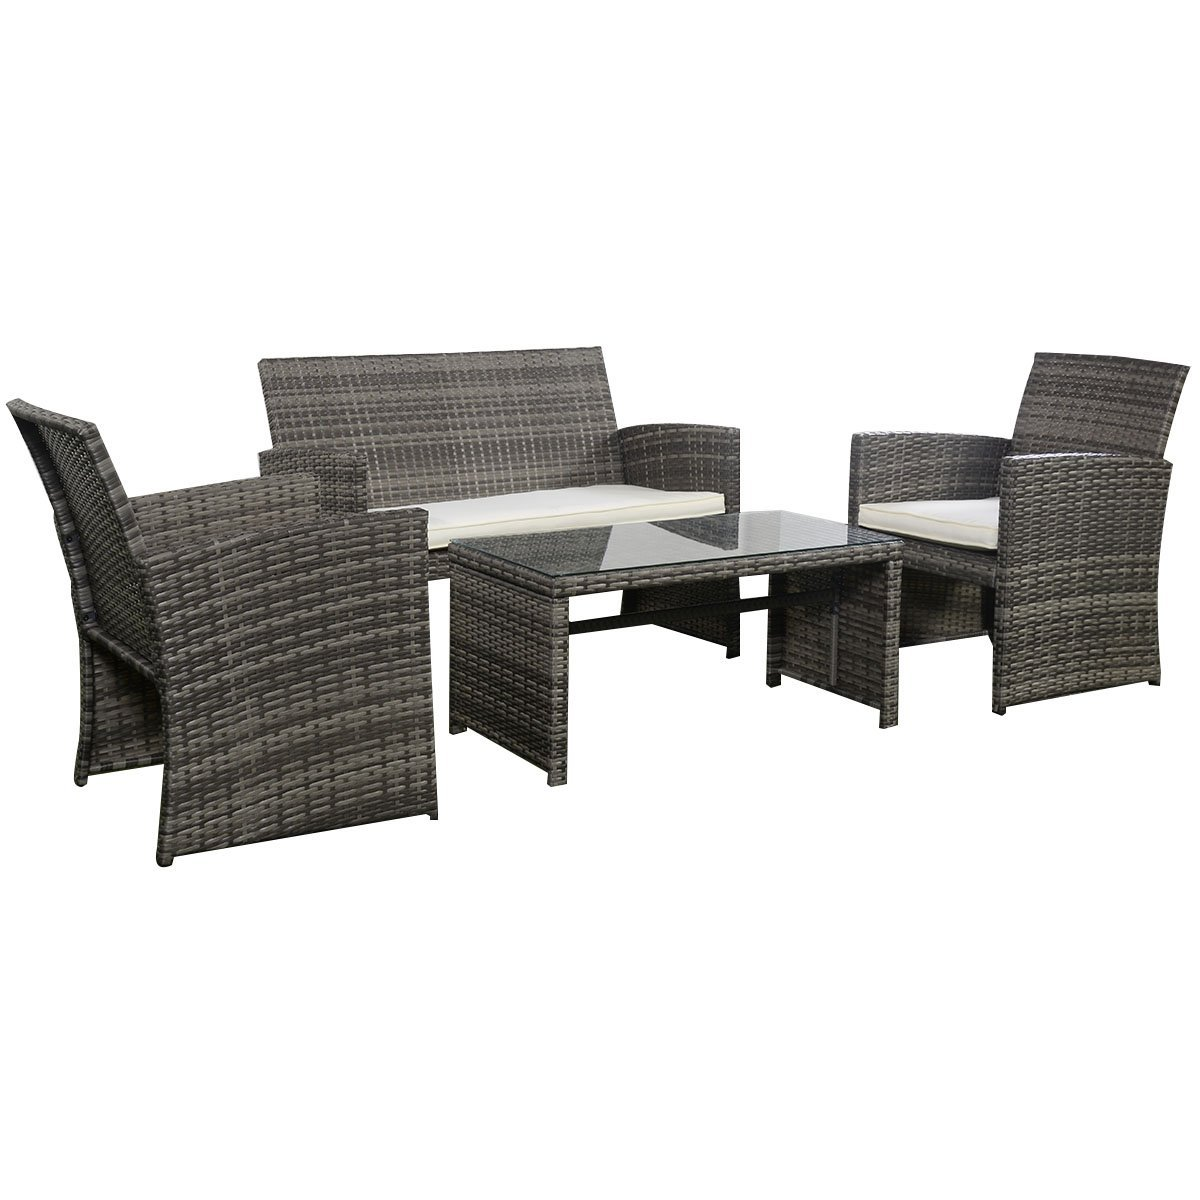 Outdoor Garden Patio 4 Piece Cushioned Seat Mix Gray Wicker Sofa Furniture Set Outdoor Patio